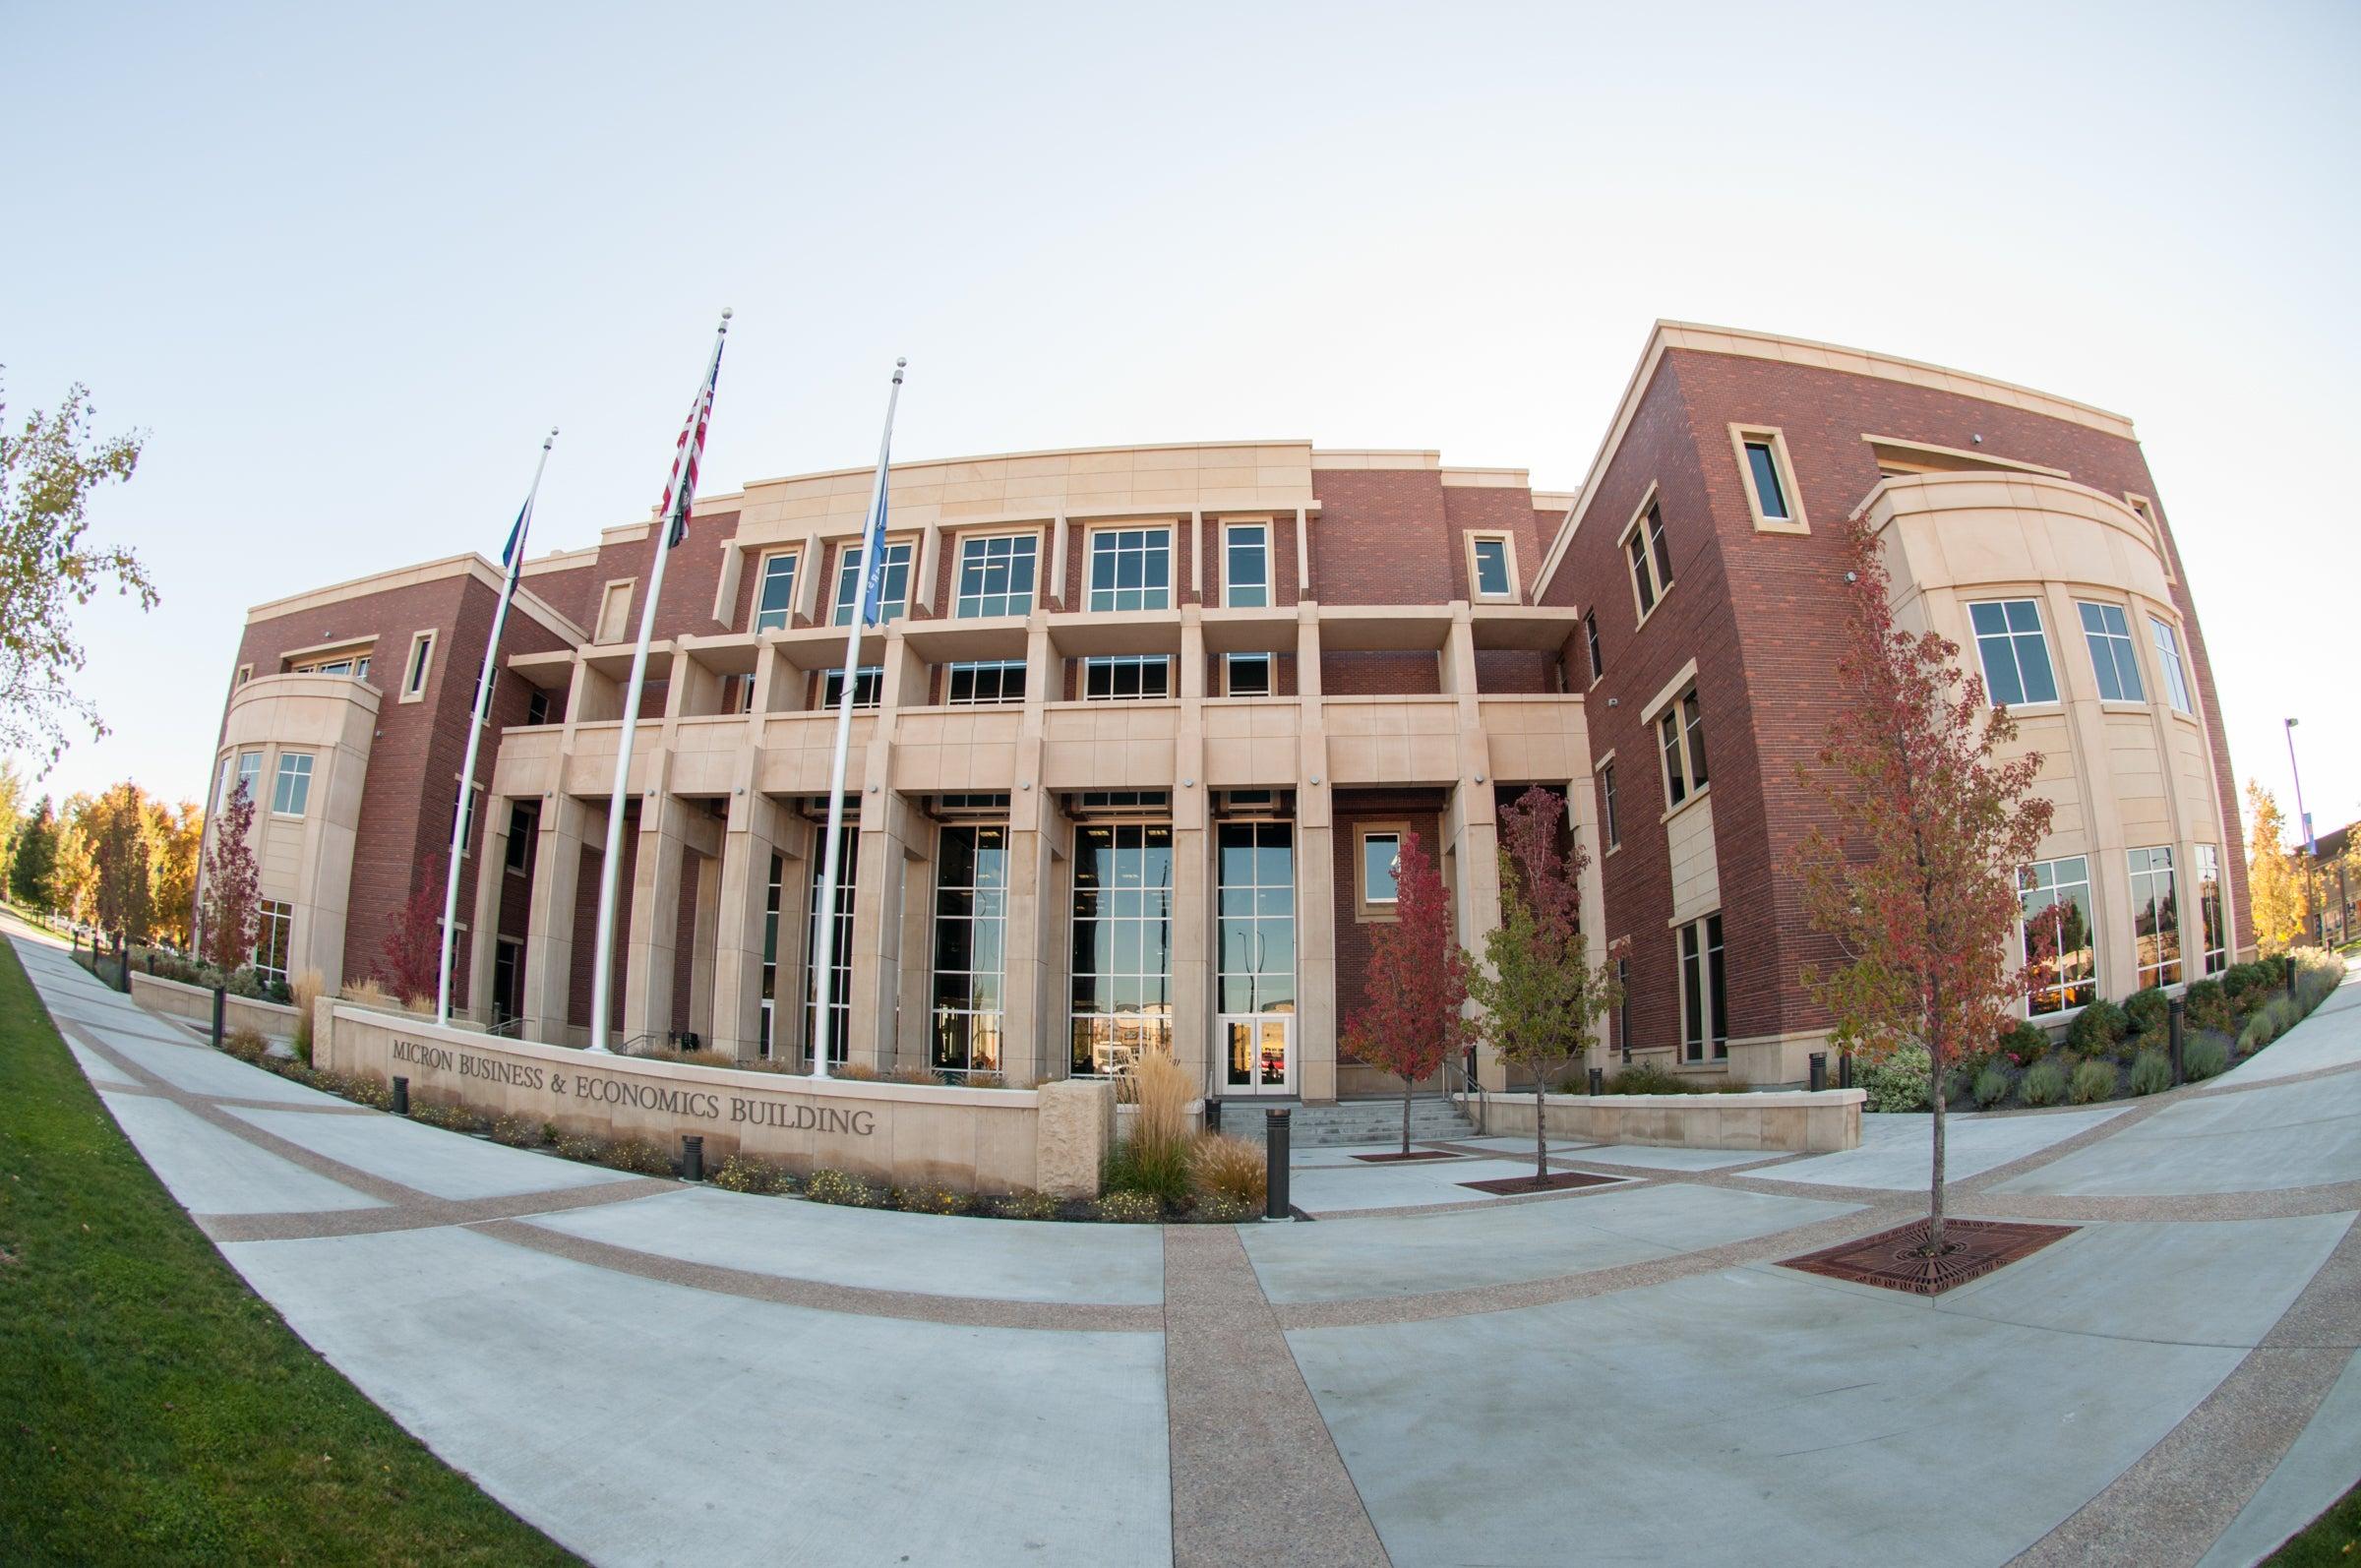 2012: Micron Business and Economics Building